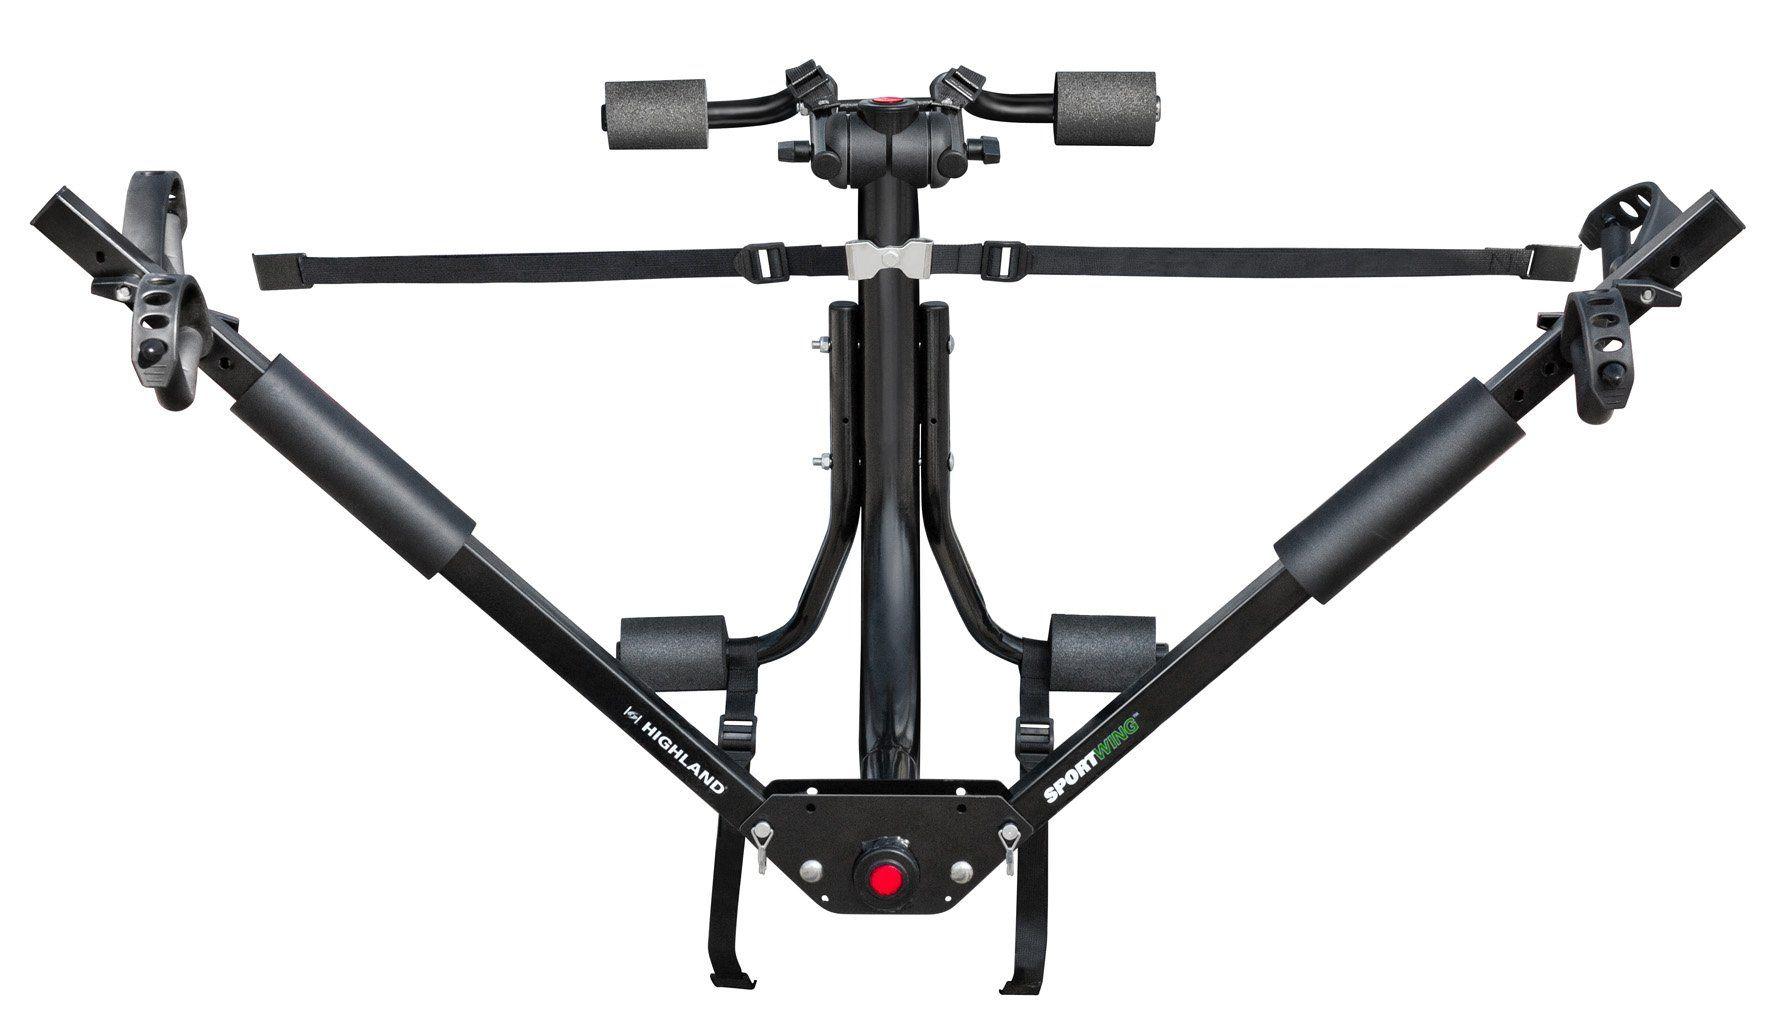 Highland (1378000) SportWing Trunk Mount Bike Rack Trunk